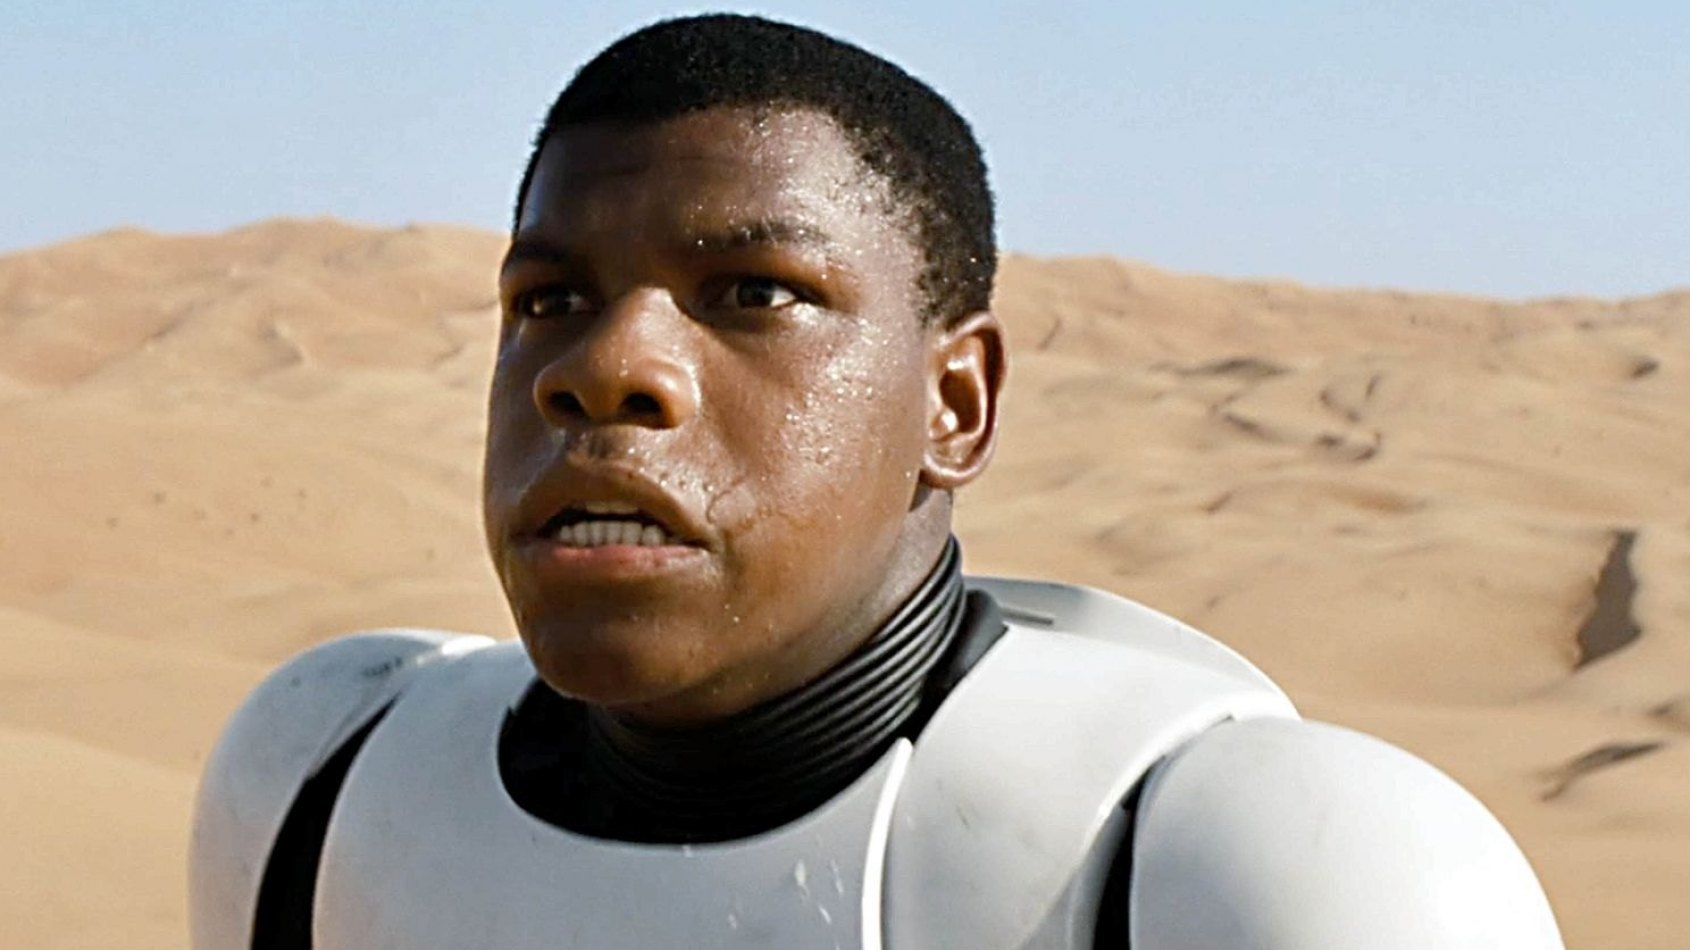 John Boyega remporte le Rising Star Awards aux BAFTA pour Star Wars